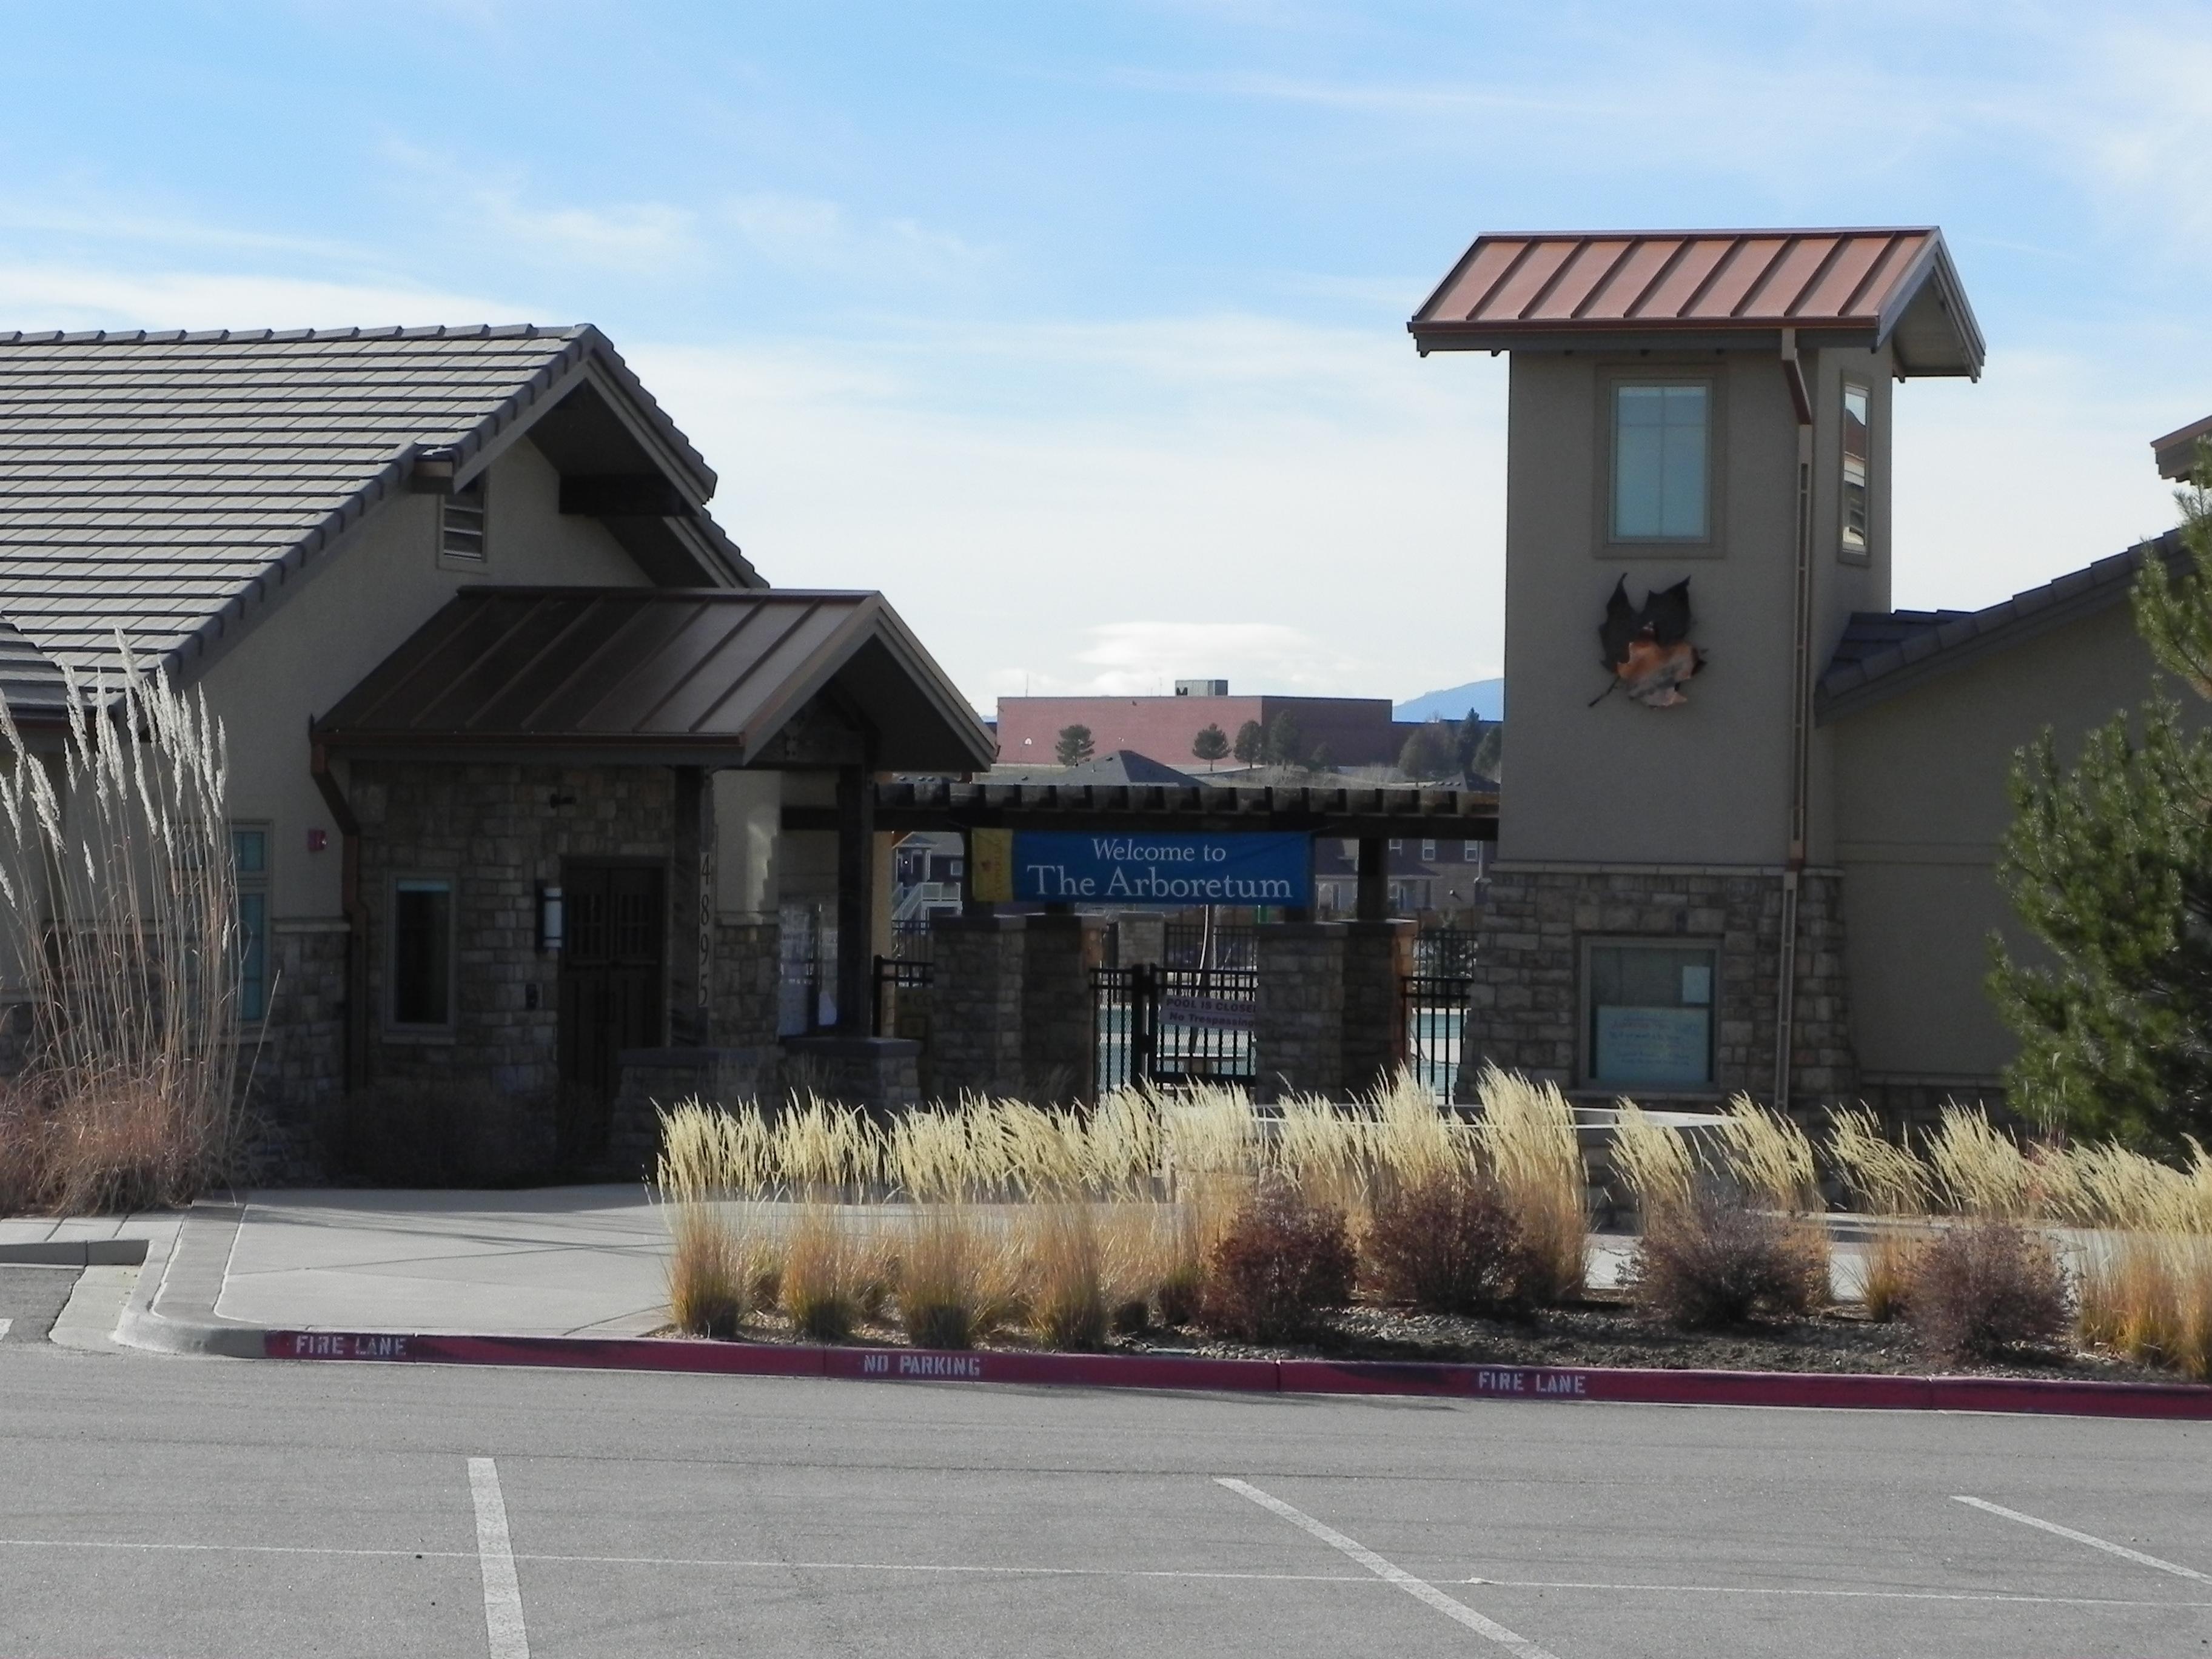 Copperleaf Community Outdoor Pool